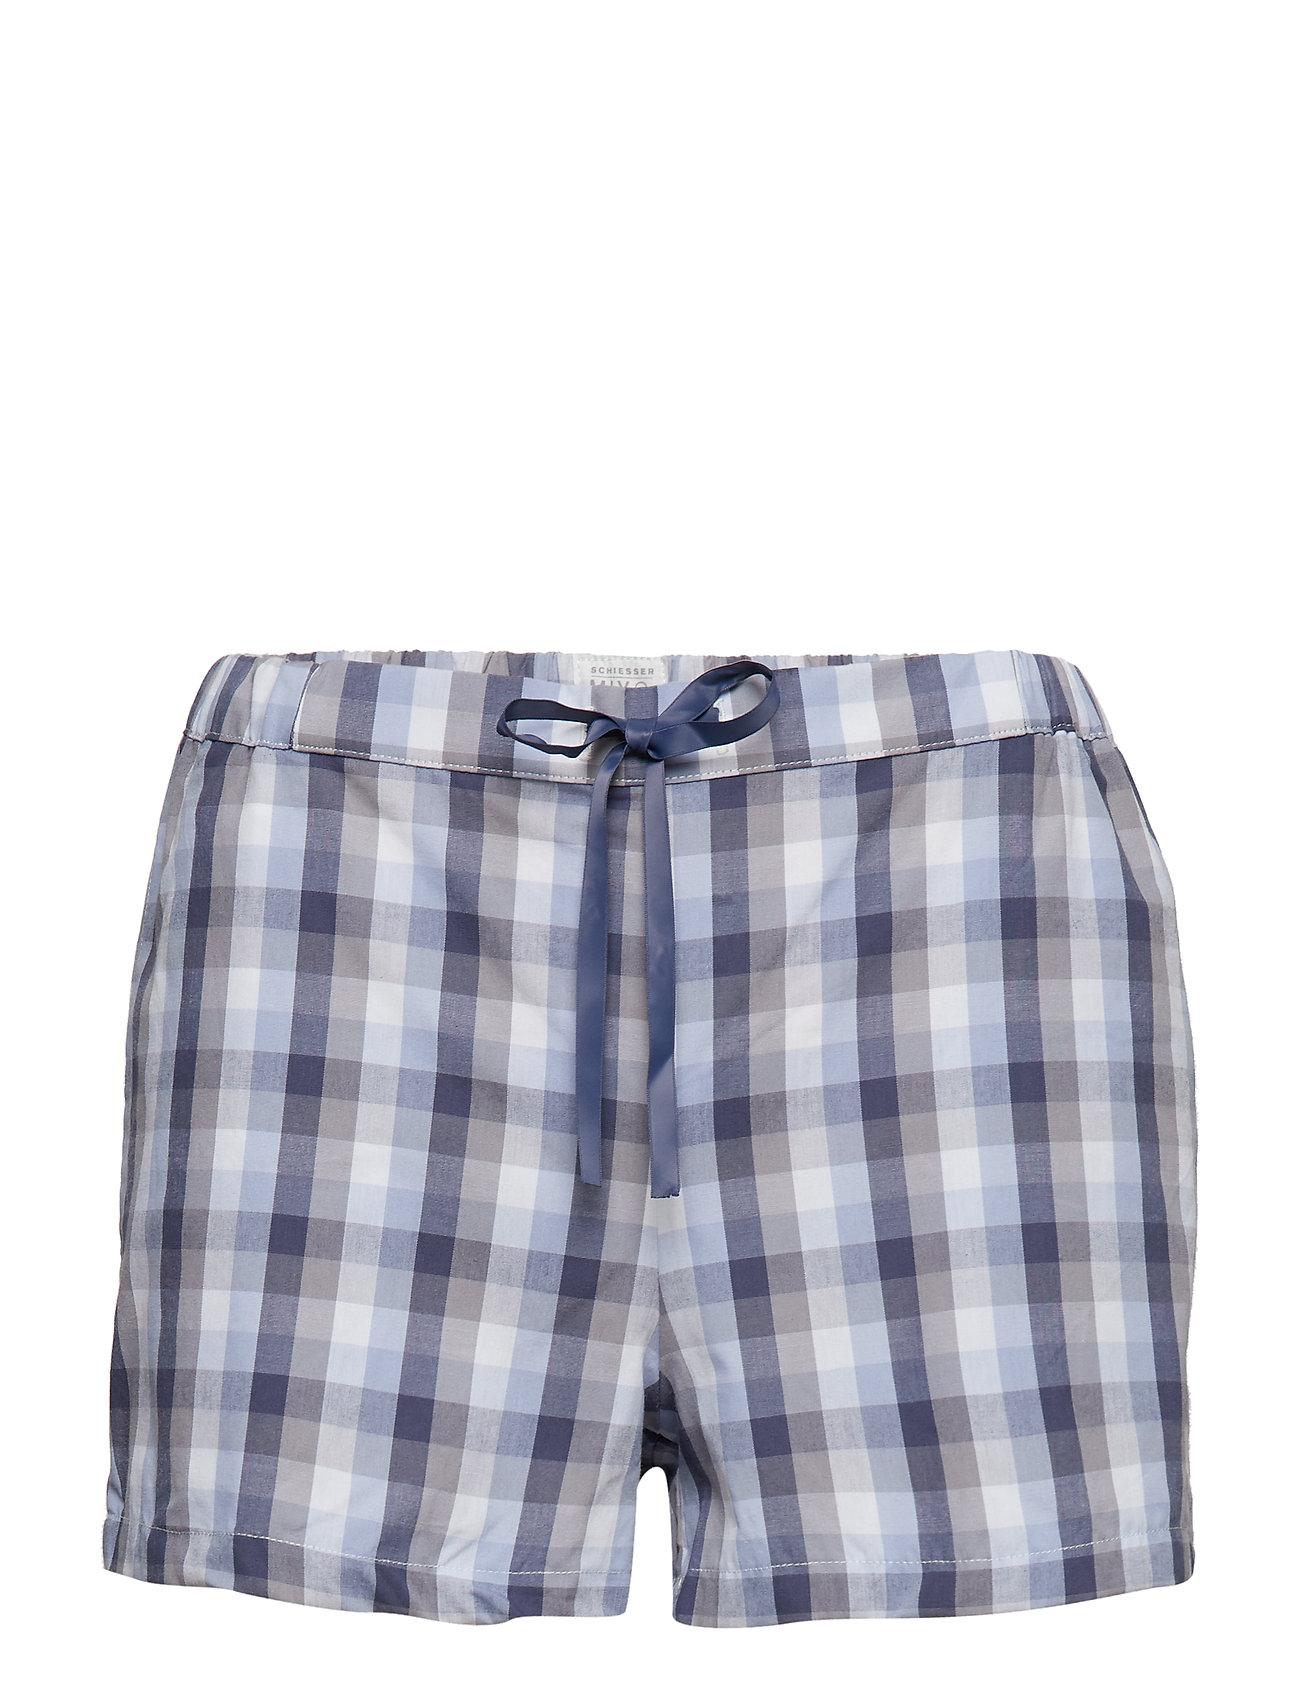 Schiesser Shorts - MULTICOLOUR